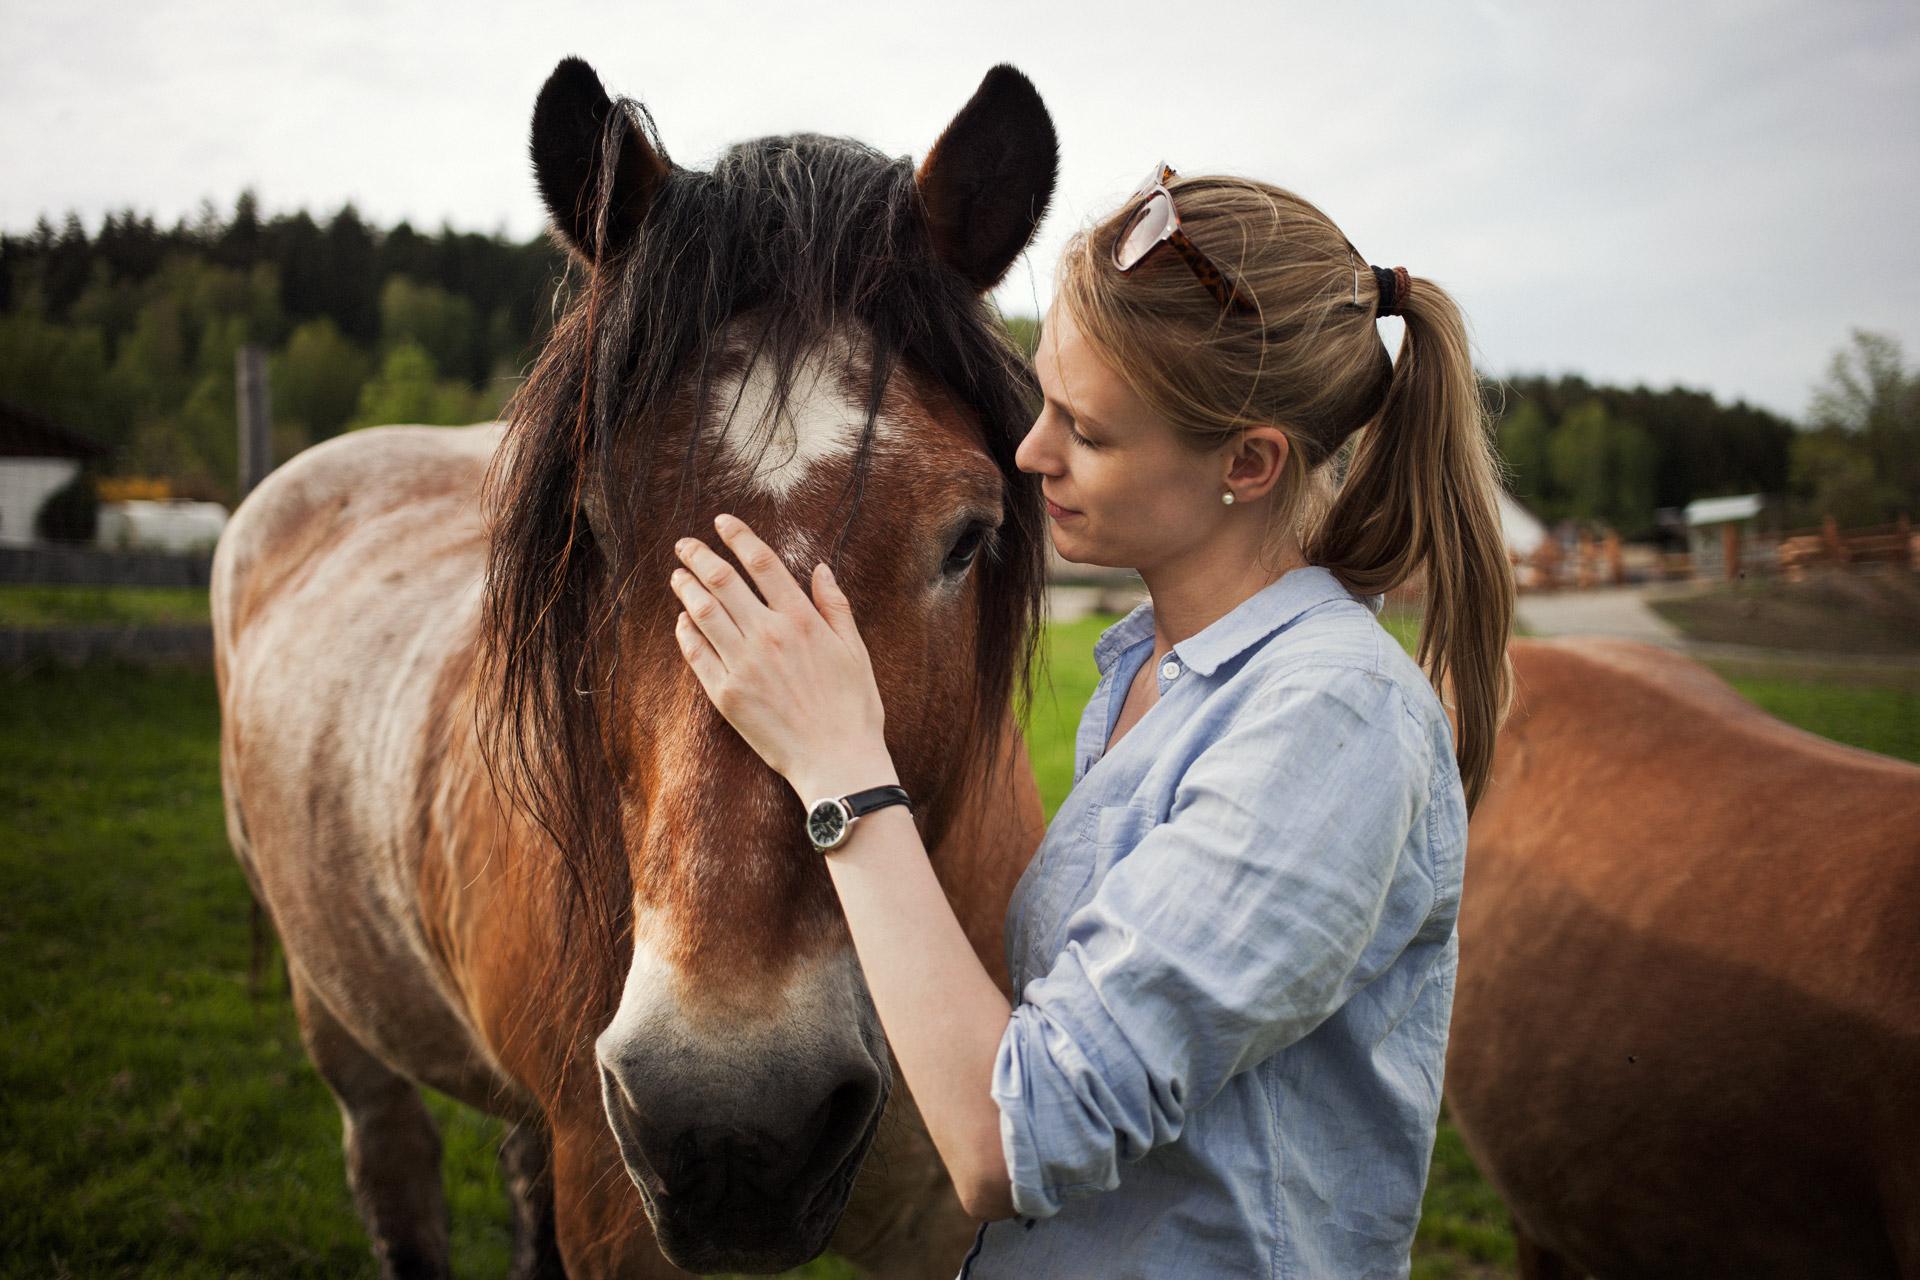 timo-stammberger-photography-animal-sanctuary-pferd-maedchen-nature-horse-erdlingshof-mitgefuehl-woman-compassion